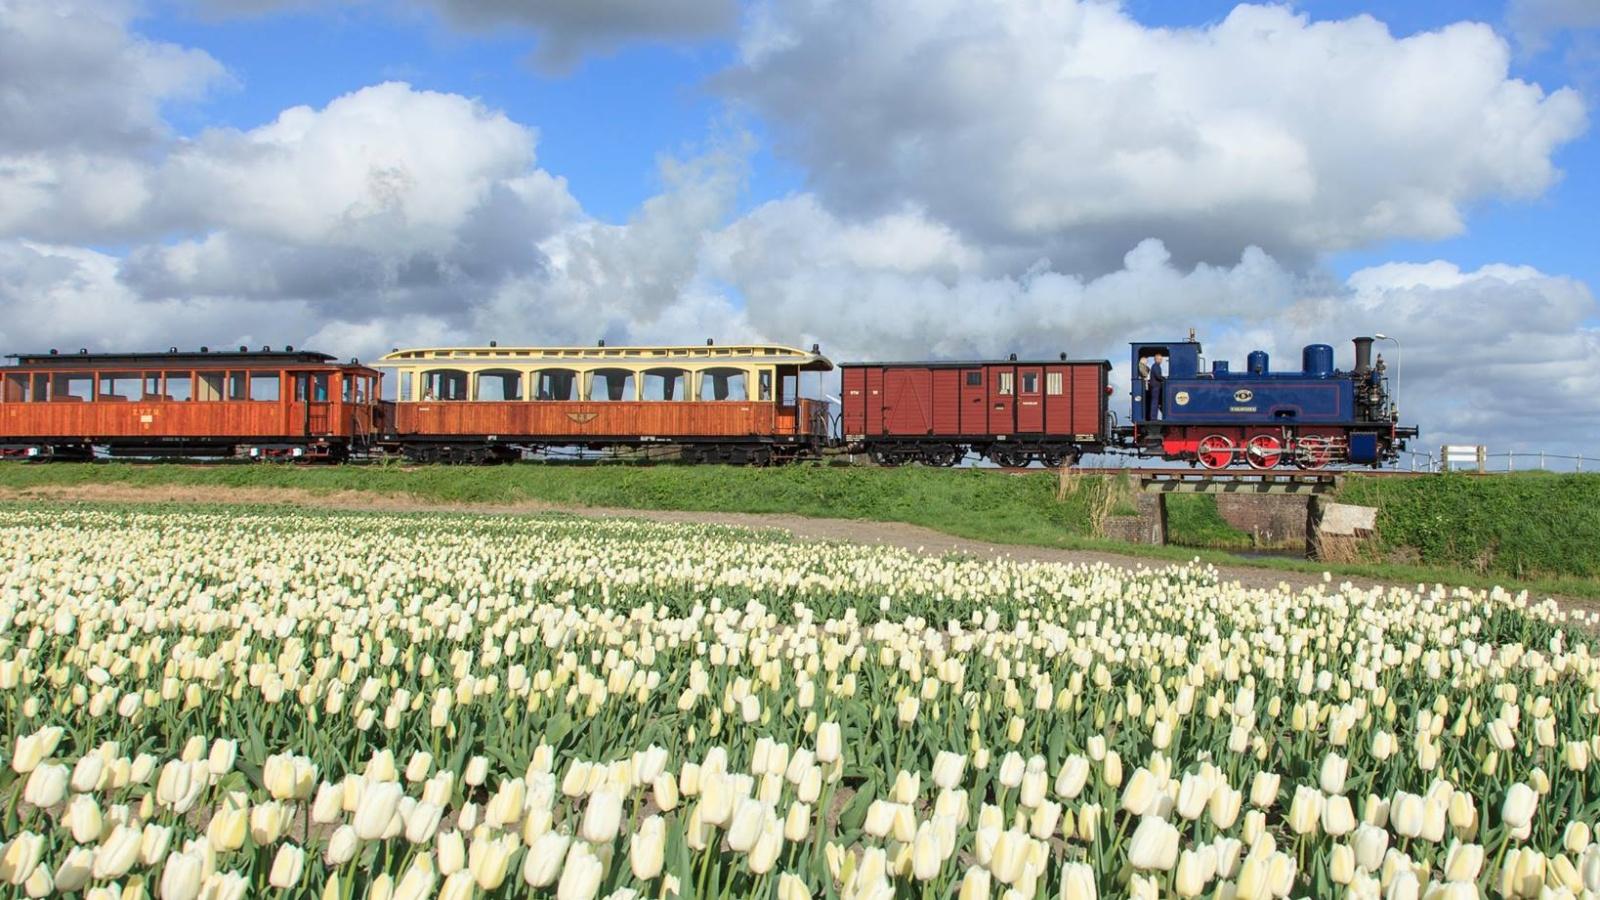 schamll-steam-train-nl